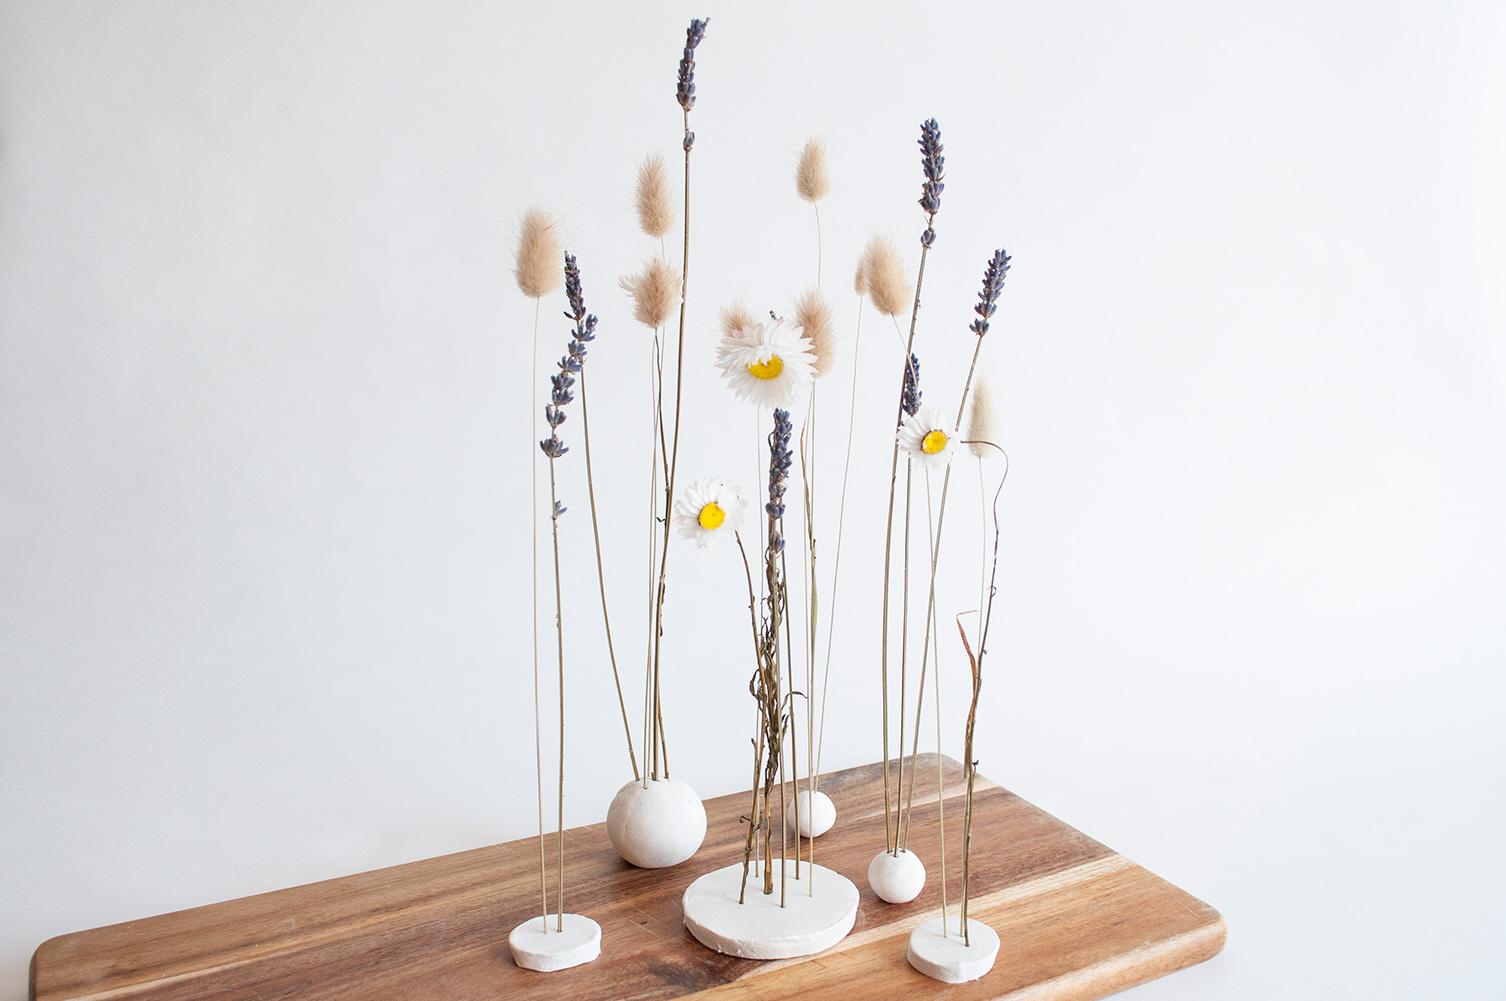 diy kleistandaard droogbloemen resultaat plank